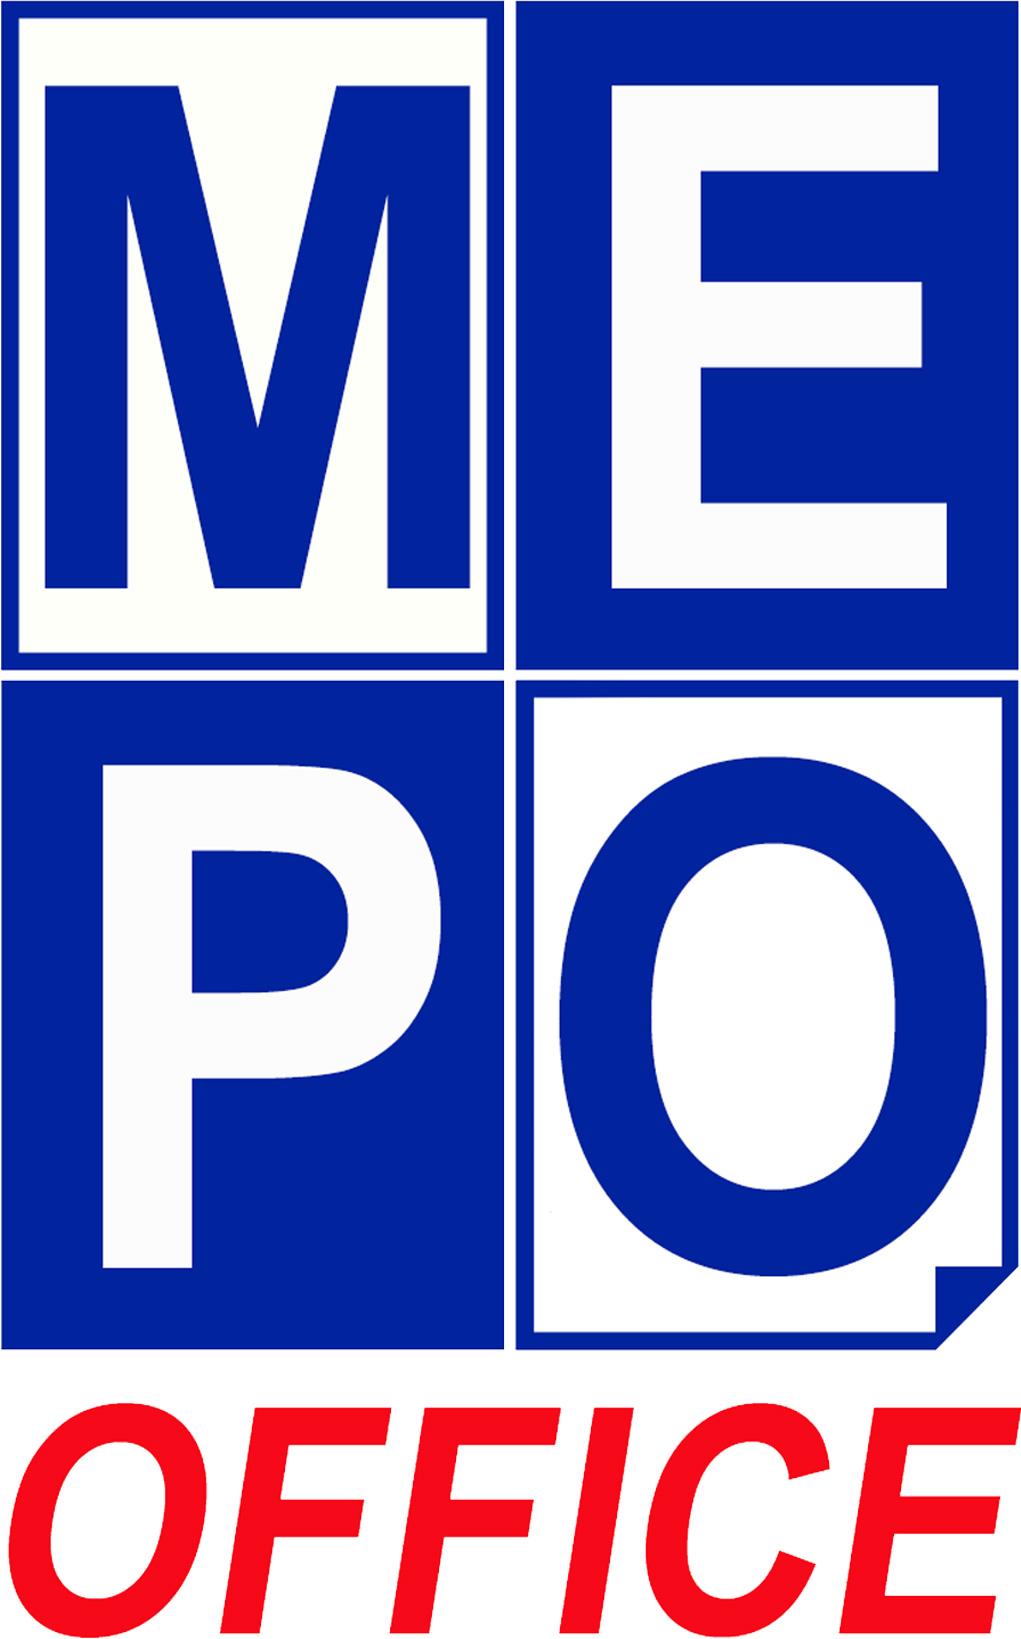 http://www.mepo-office.nl